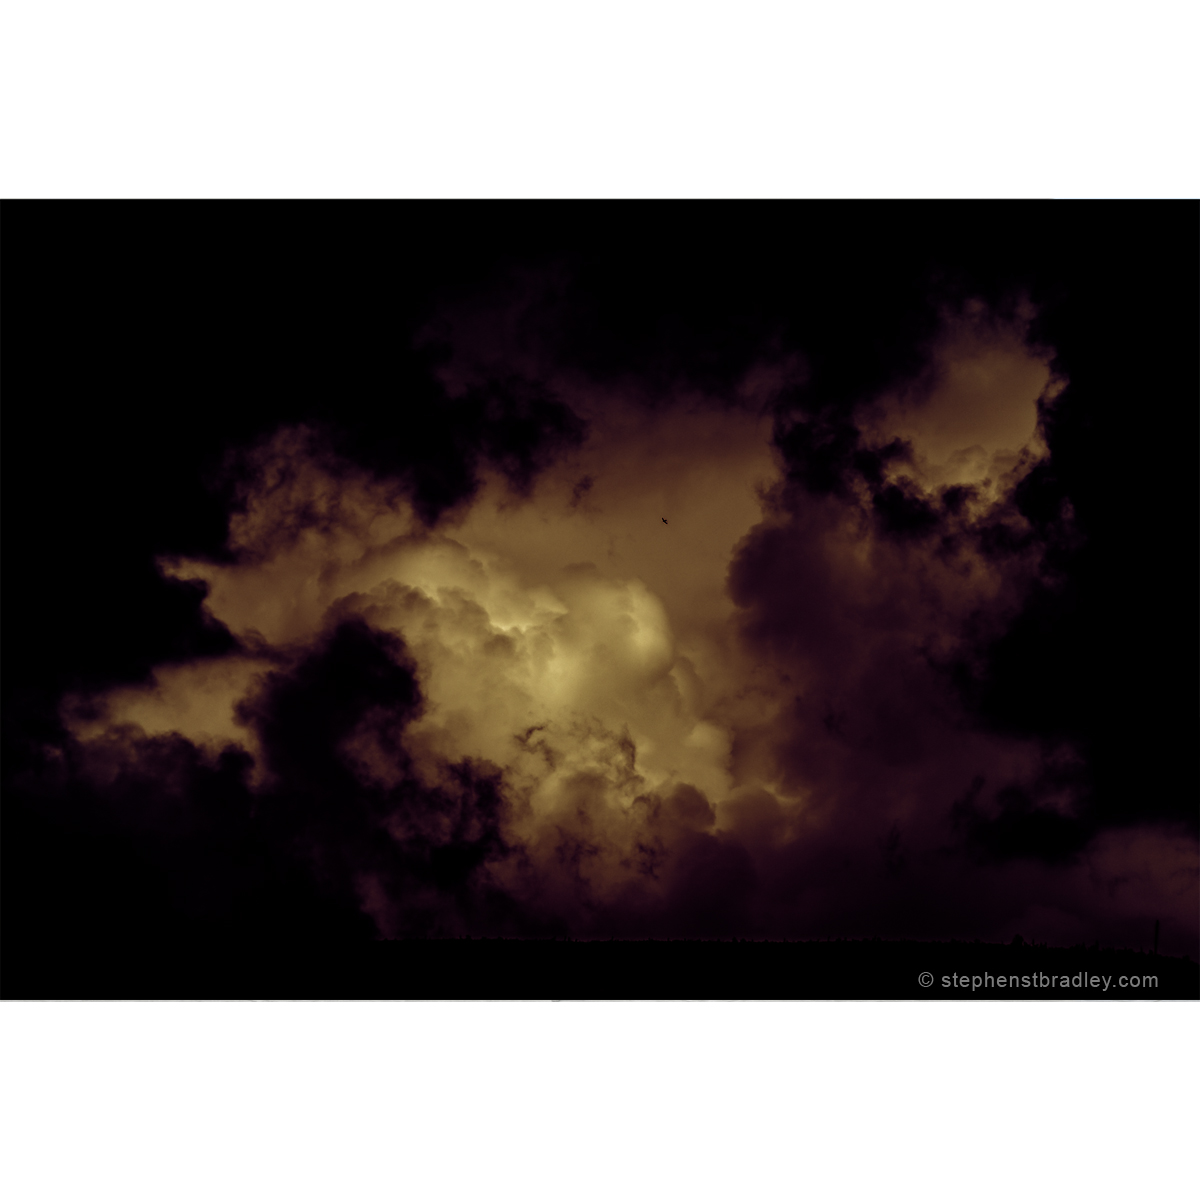 Wonderworld - fine art photograph by Stephen S T Bradley for sale